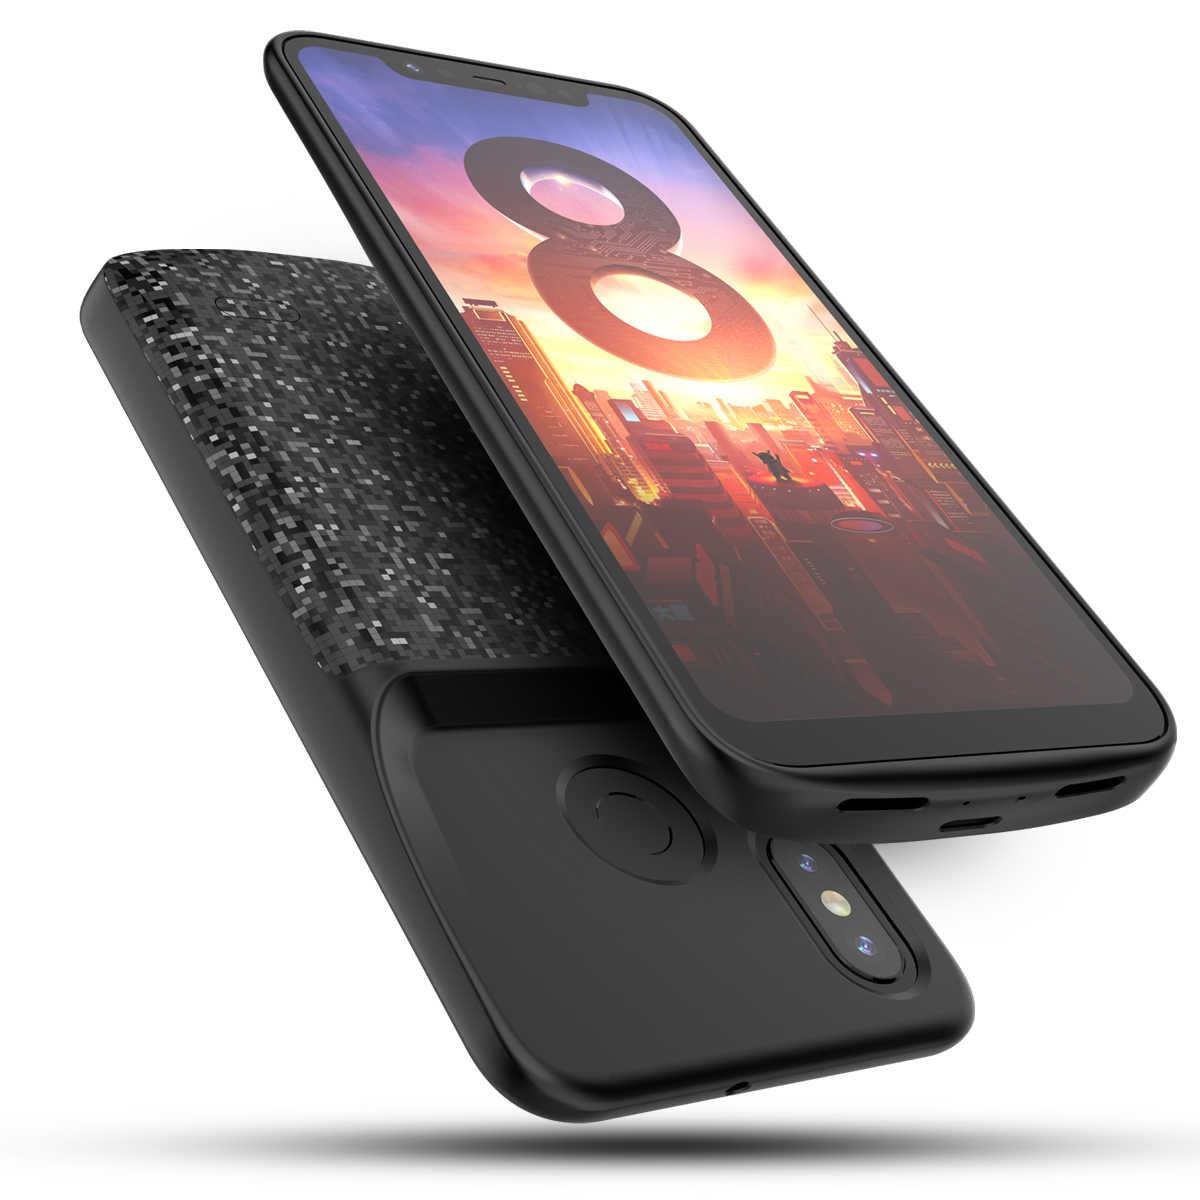 Egeedigi для Xiaomi Mi 8 8 Se 8 Lite резервного питания банк зарядный чехол для Xiaomi Mi 8/SE/Lite зарядное устройство Внешний чехол